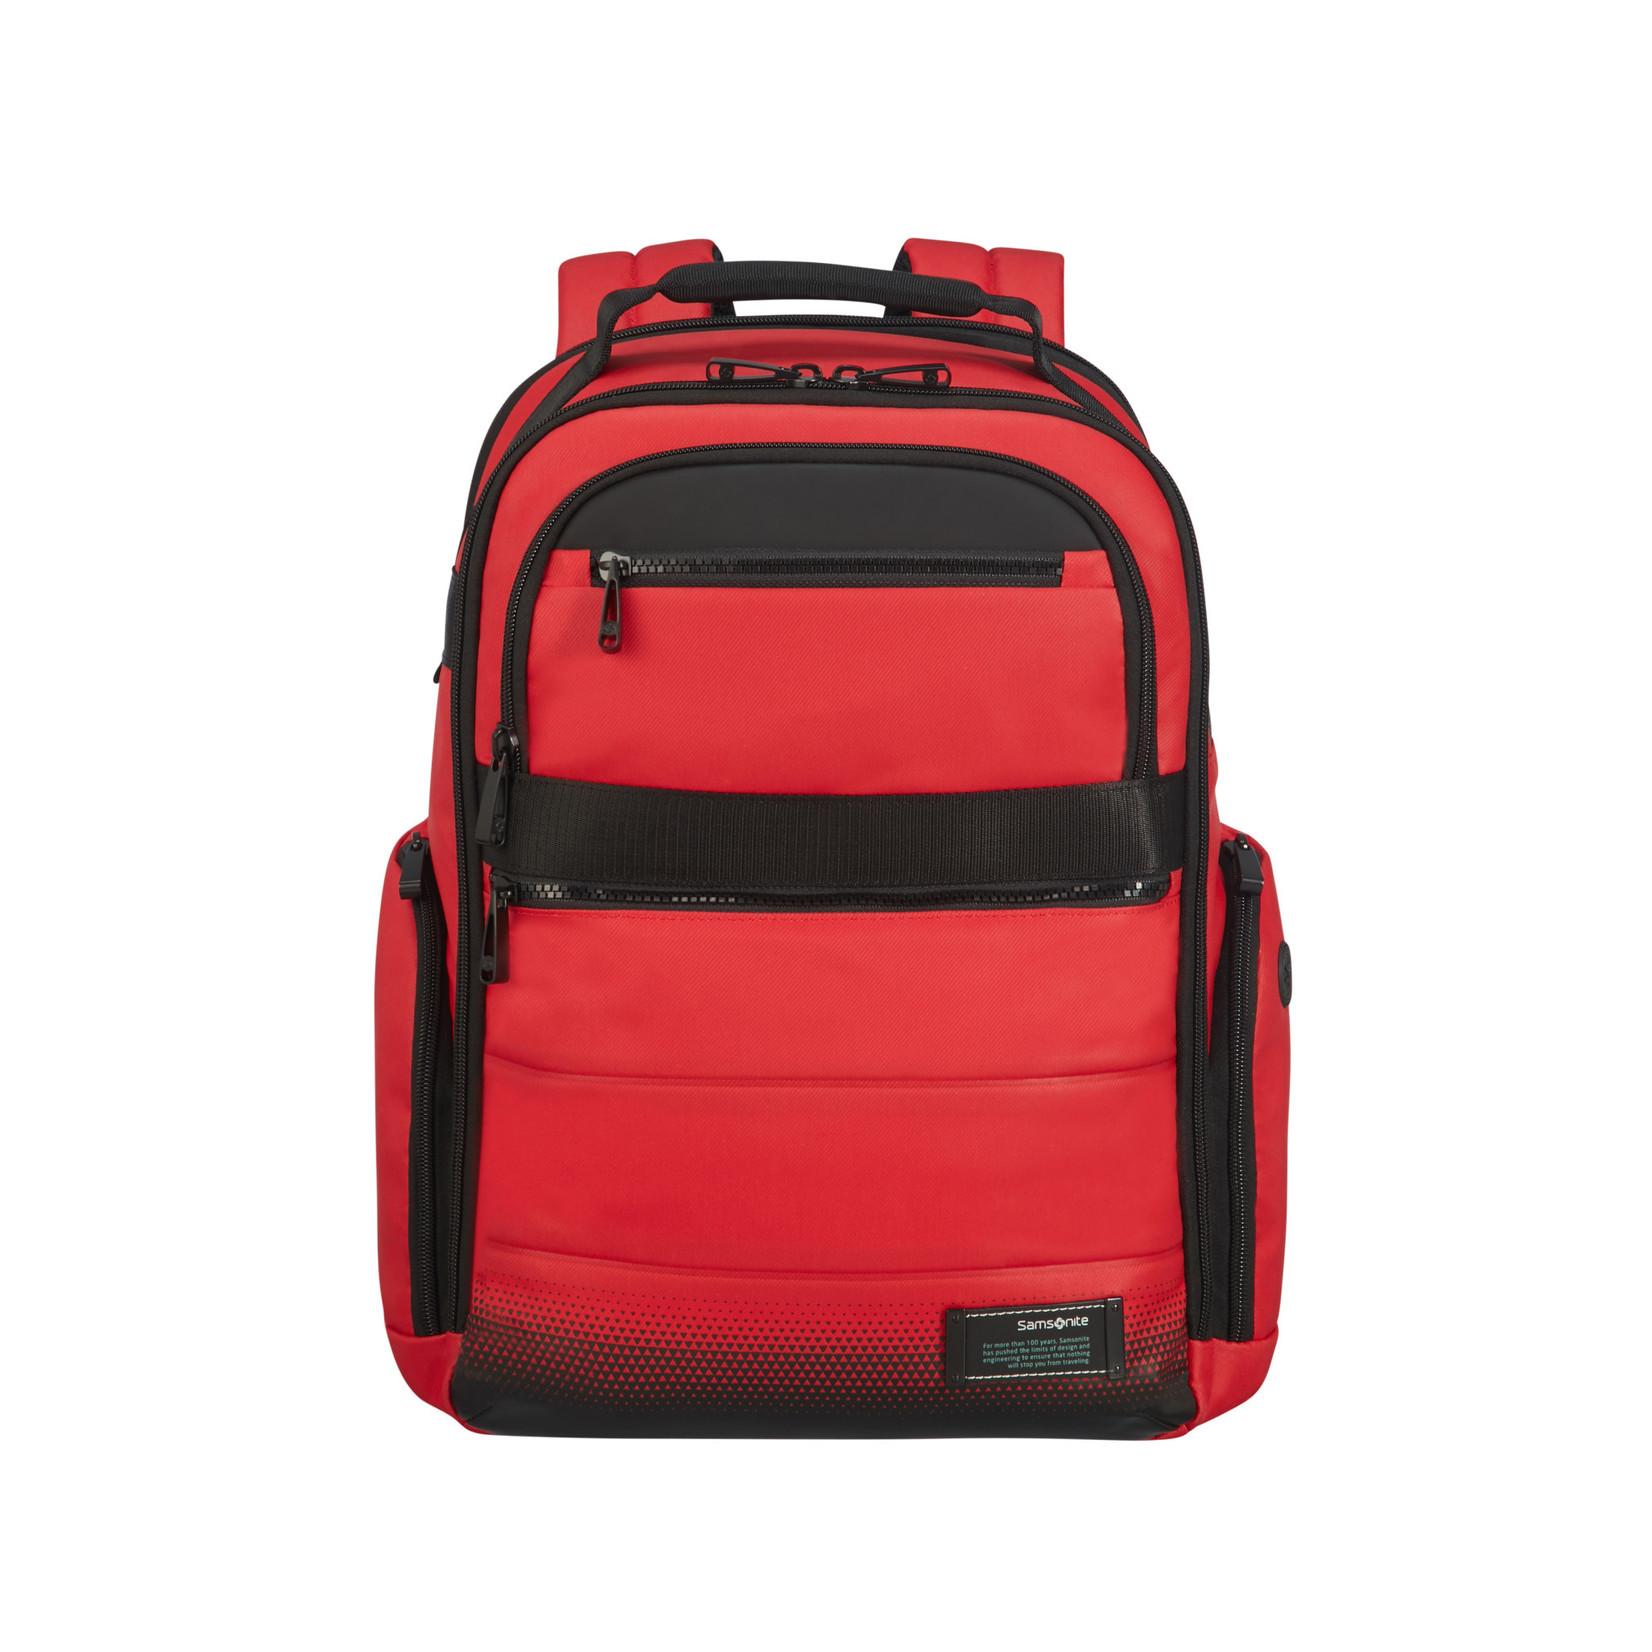 "Samsonite Laptoprugtas Cityvibe 2.0 Lava Red 15,6"""